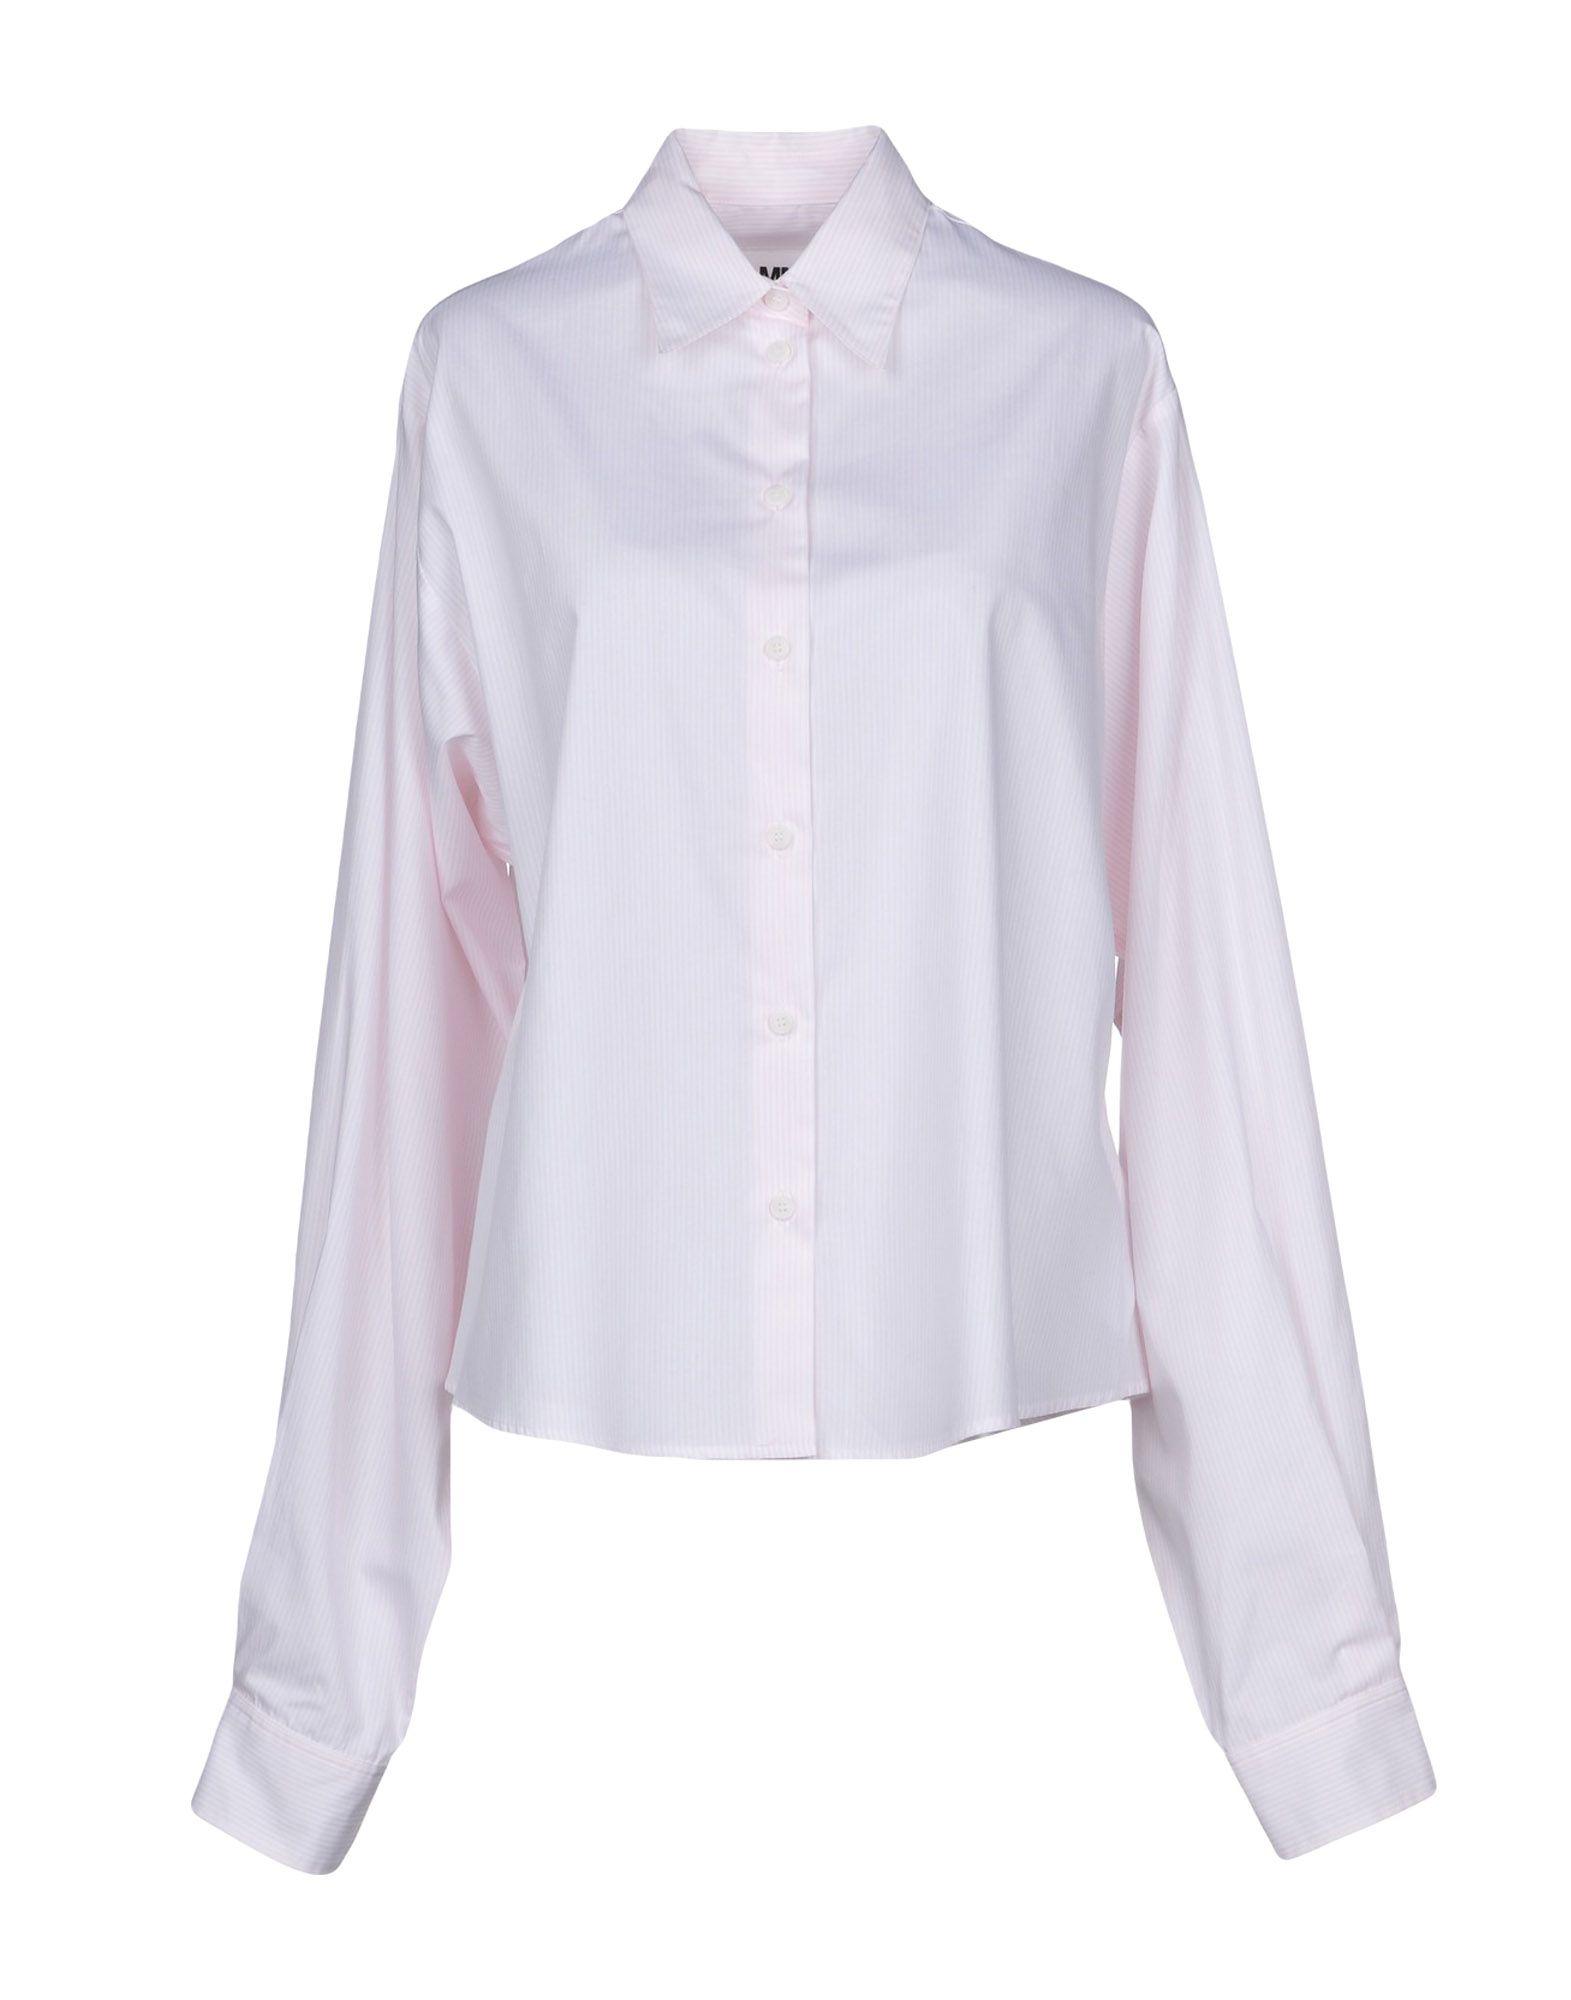 Camicia A Righe Mm6 Maison Margiela Donna - Acquista online su bGd4EY